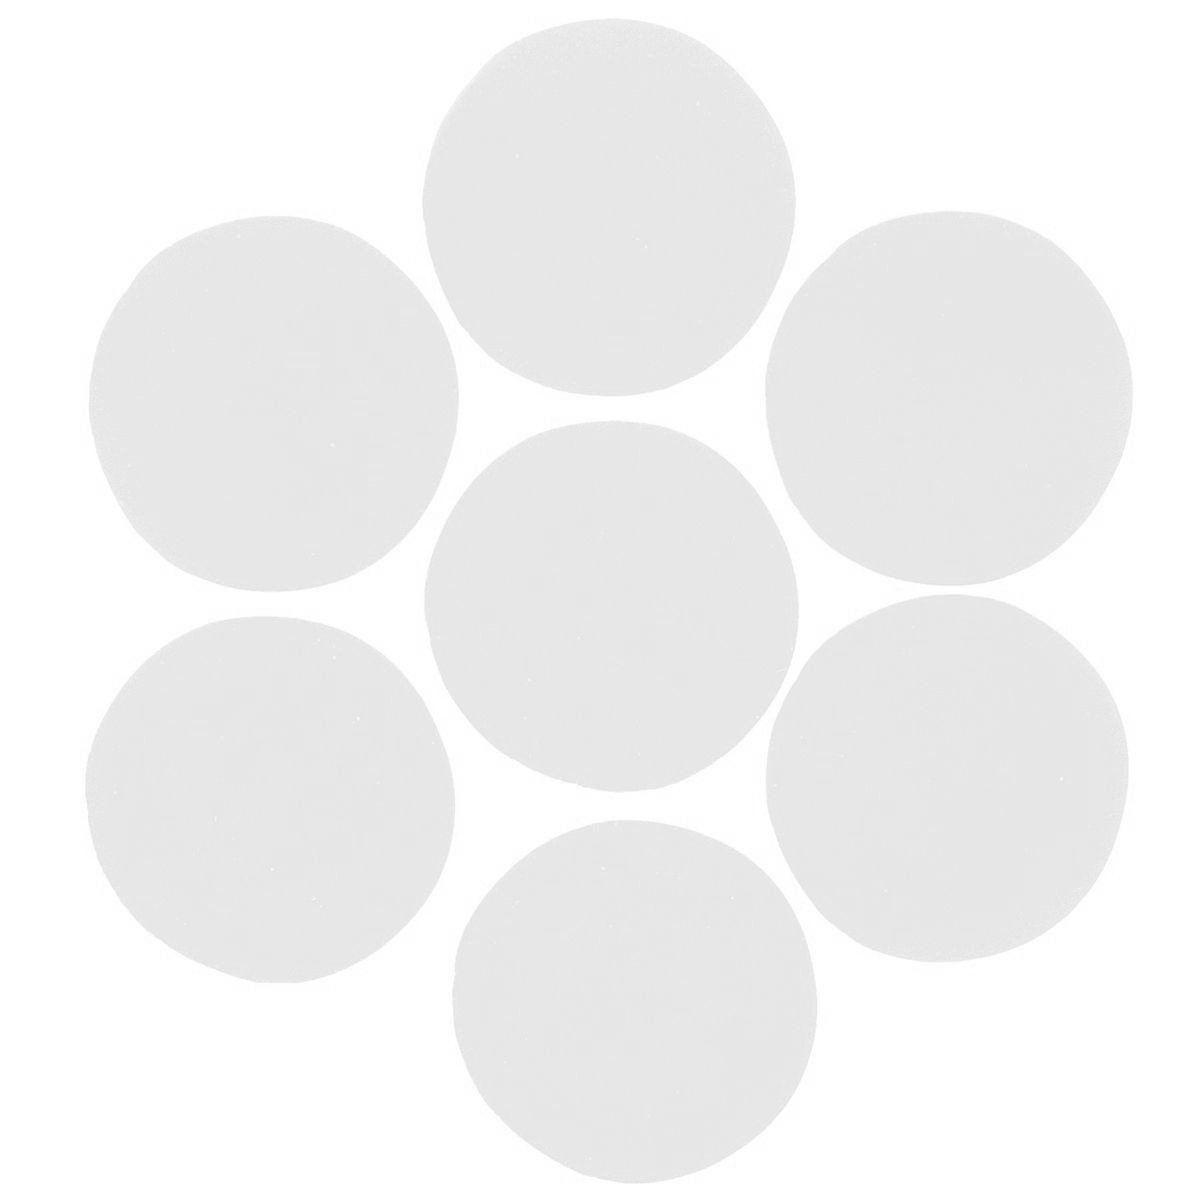 Конфетти кружочки белые 23мм